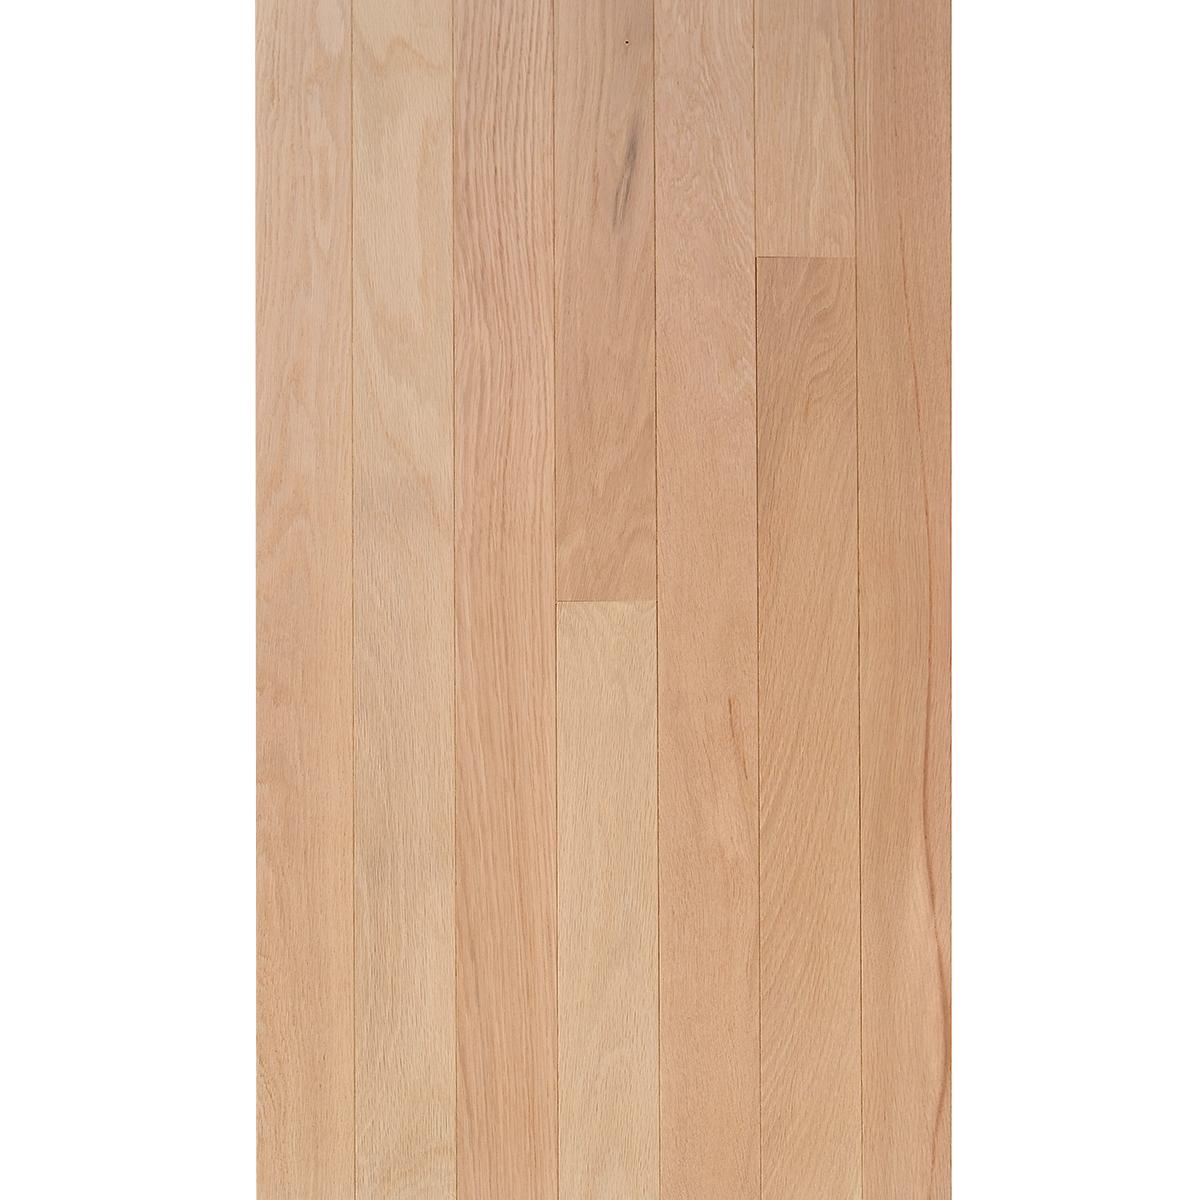 White Oak 3 4 X 3 1 4 Select Grade Flooring